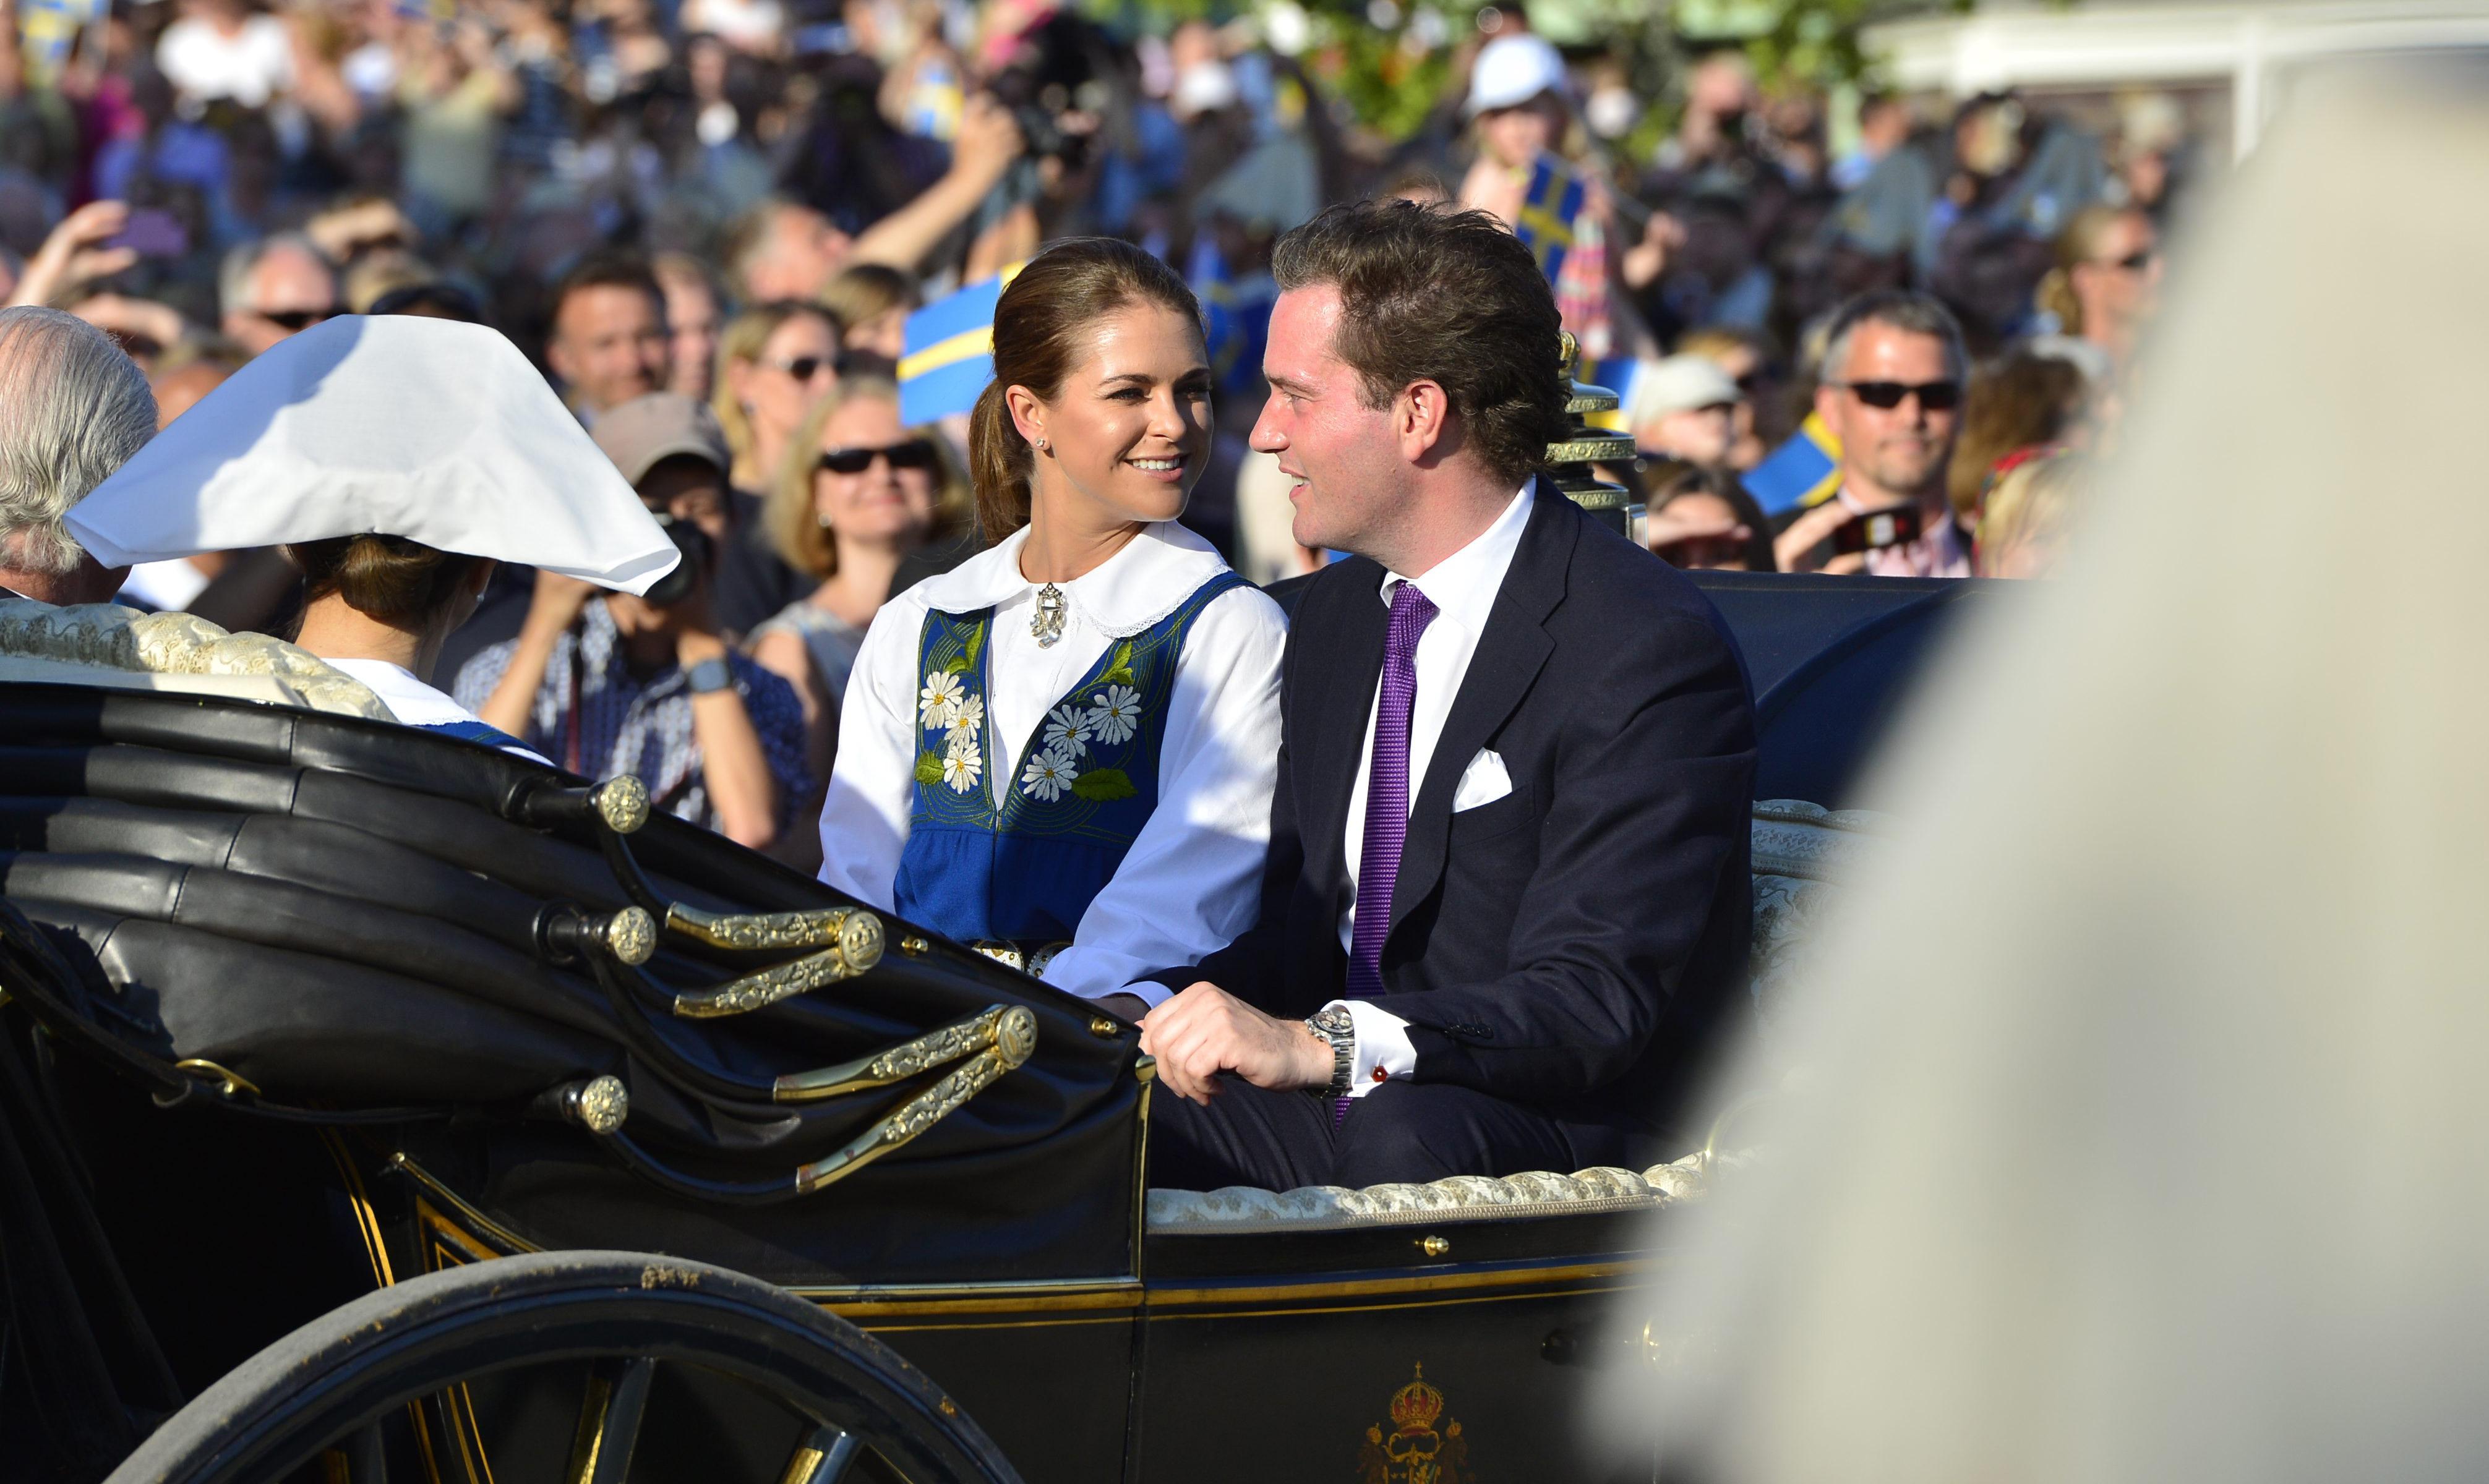 Madeleine och Chris O'Neill gifter sig. Foto: Henrik Montgomery/Scanpix.